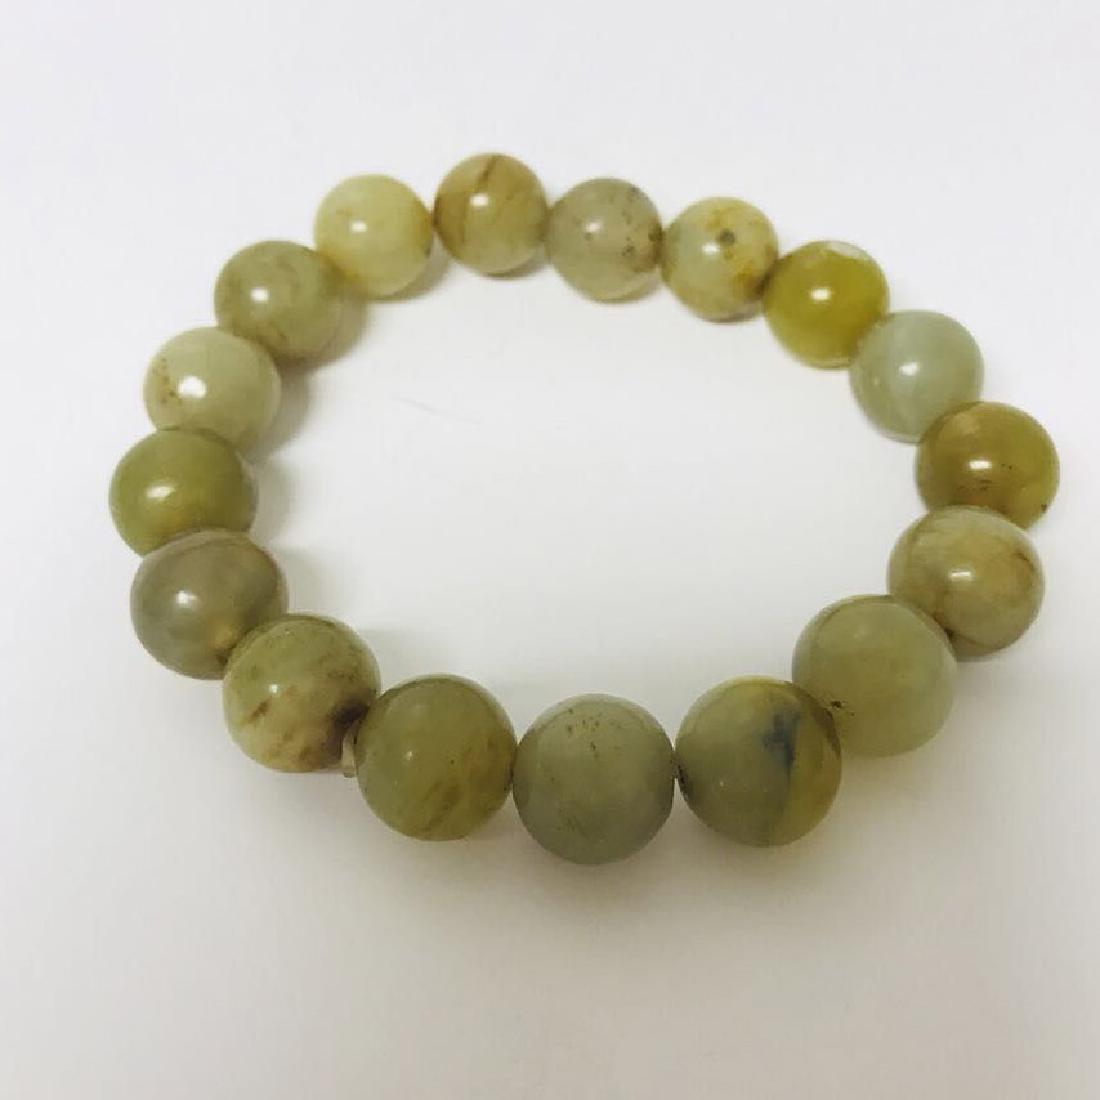 Old Jade beads bracelet